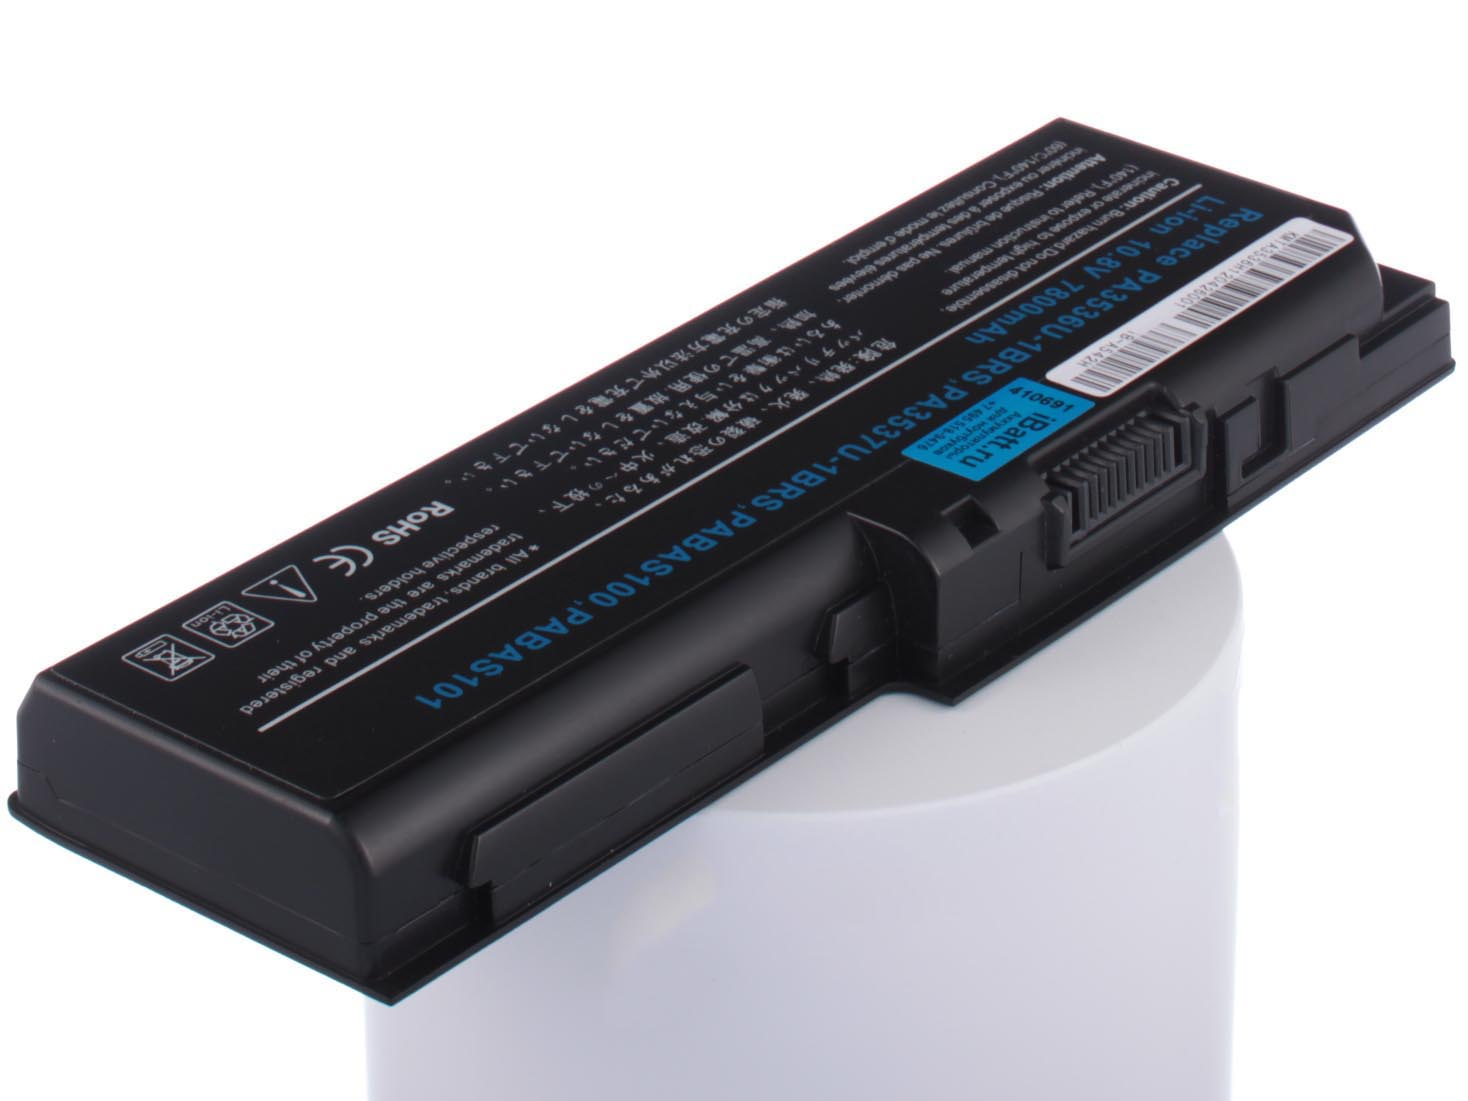 Аккумулятор для ноутбука iBatt для ToshiBa Satellite P300-226, Satellite P305D, Satellite X200-23G, Satellite P305, Satellite L350-17Z, Satellite L355, Satellite X200-22V, Satellite P200-1BA, Satellite P200D-12O, Satego X200 аккумулятор gerffins для samsung e1050 e1085 x200